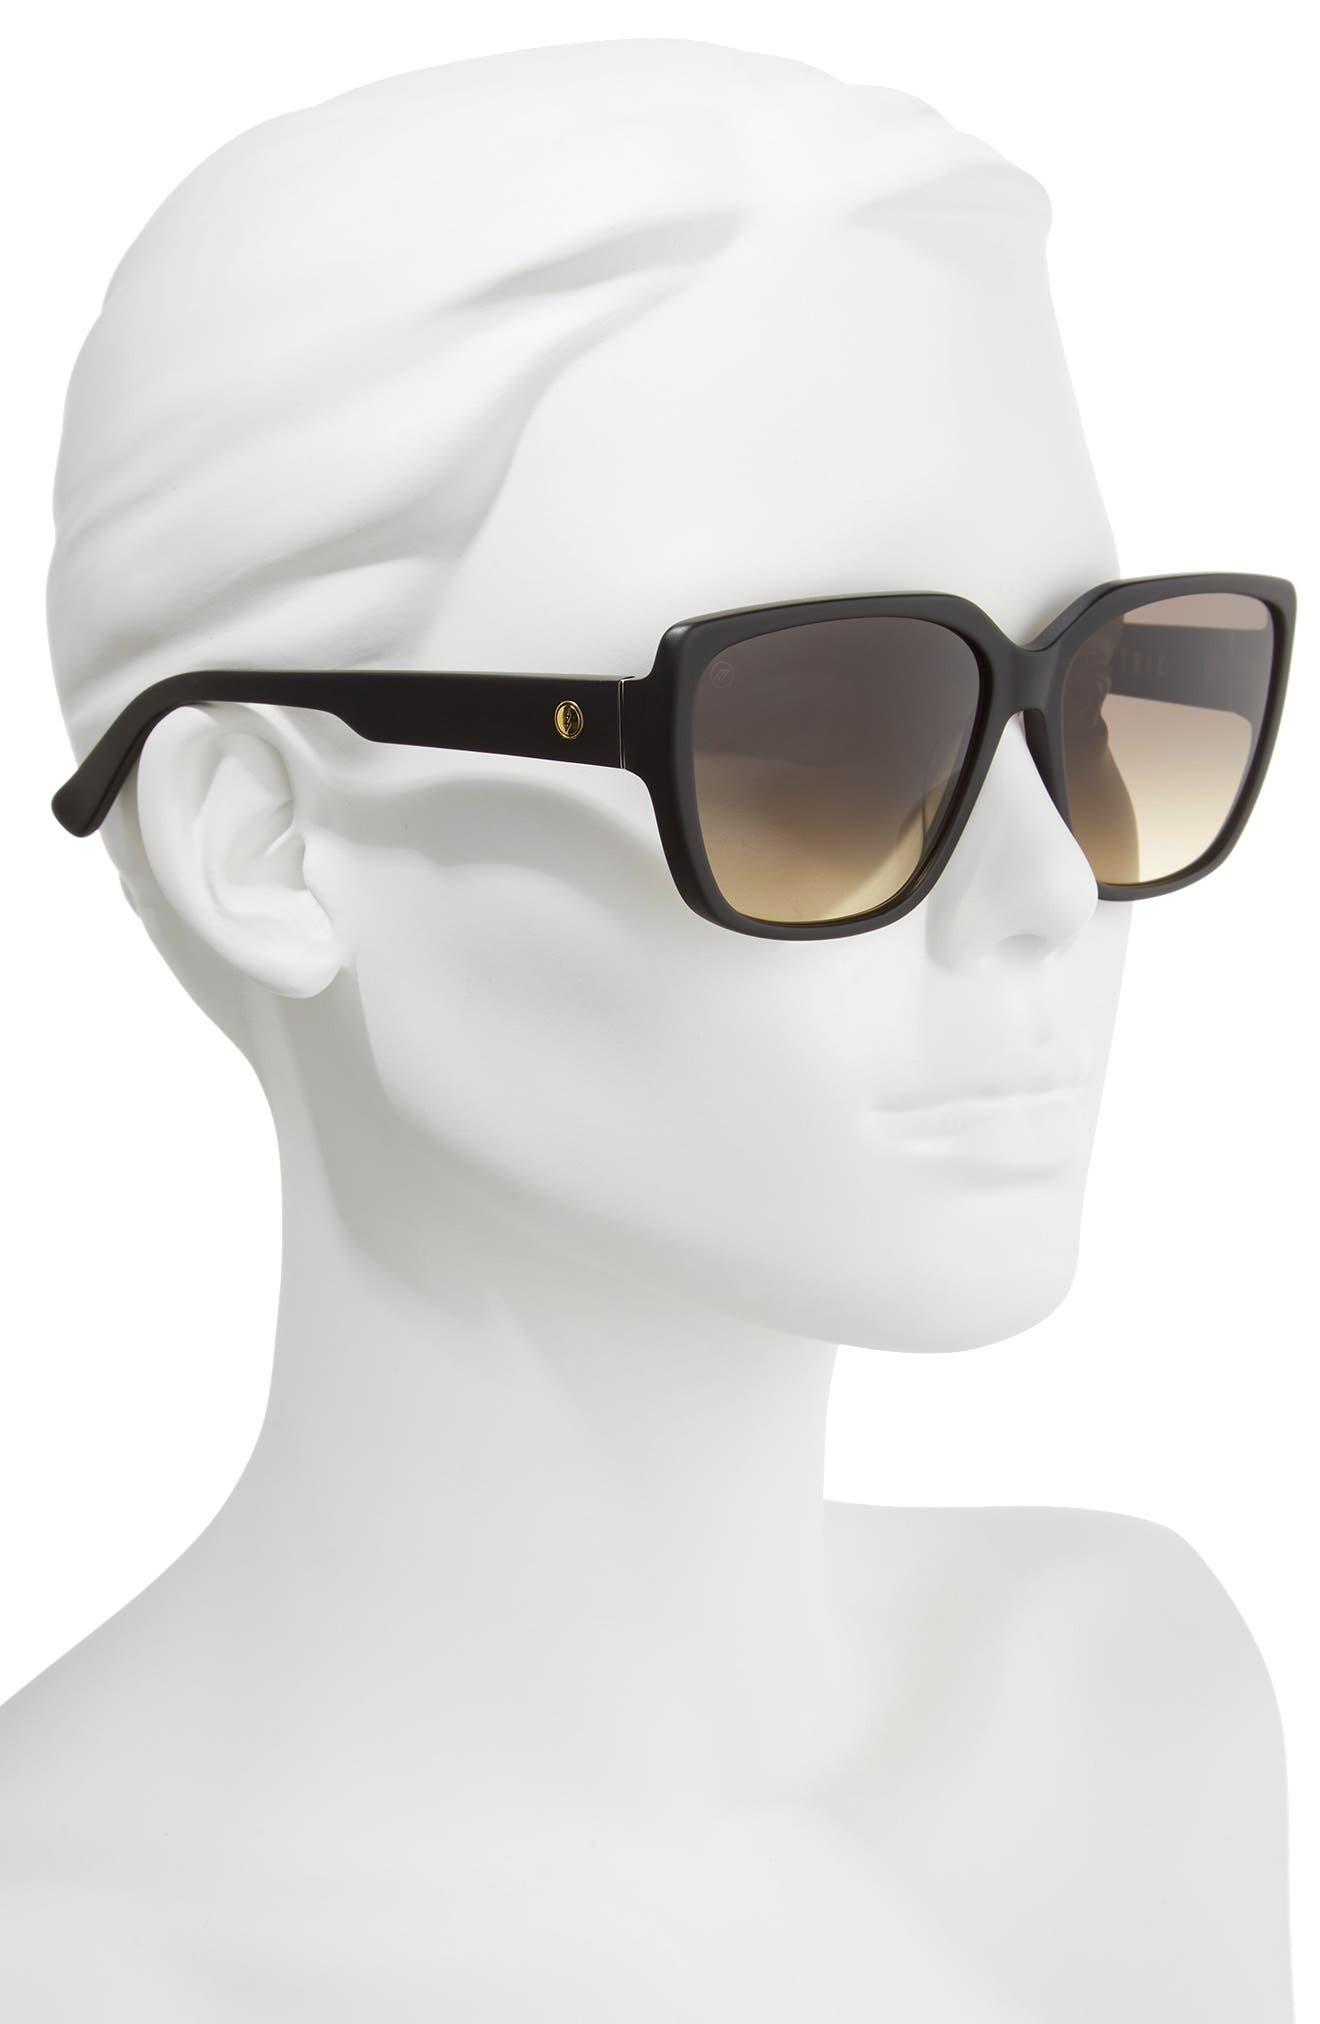 Honey Bee 60mm Mirrored Sunglasses,                             Alternate thumbnail 3, color,                             Matte Black/ Black Gradient